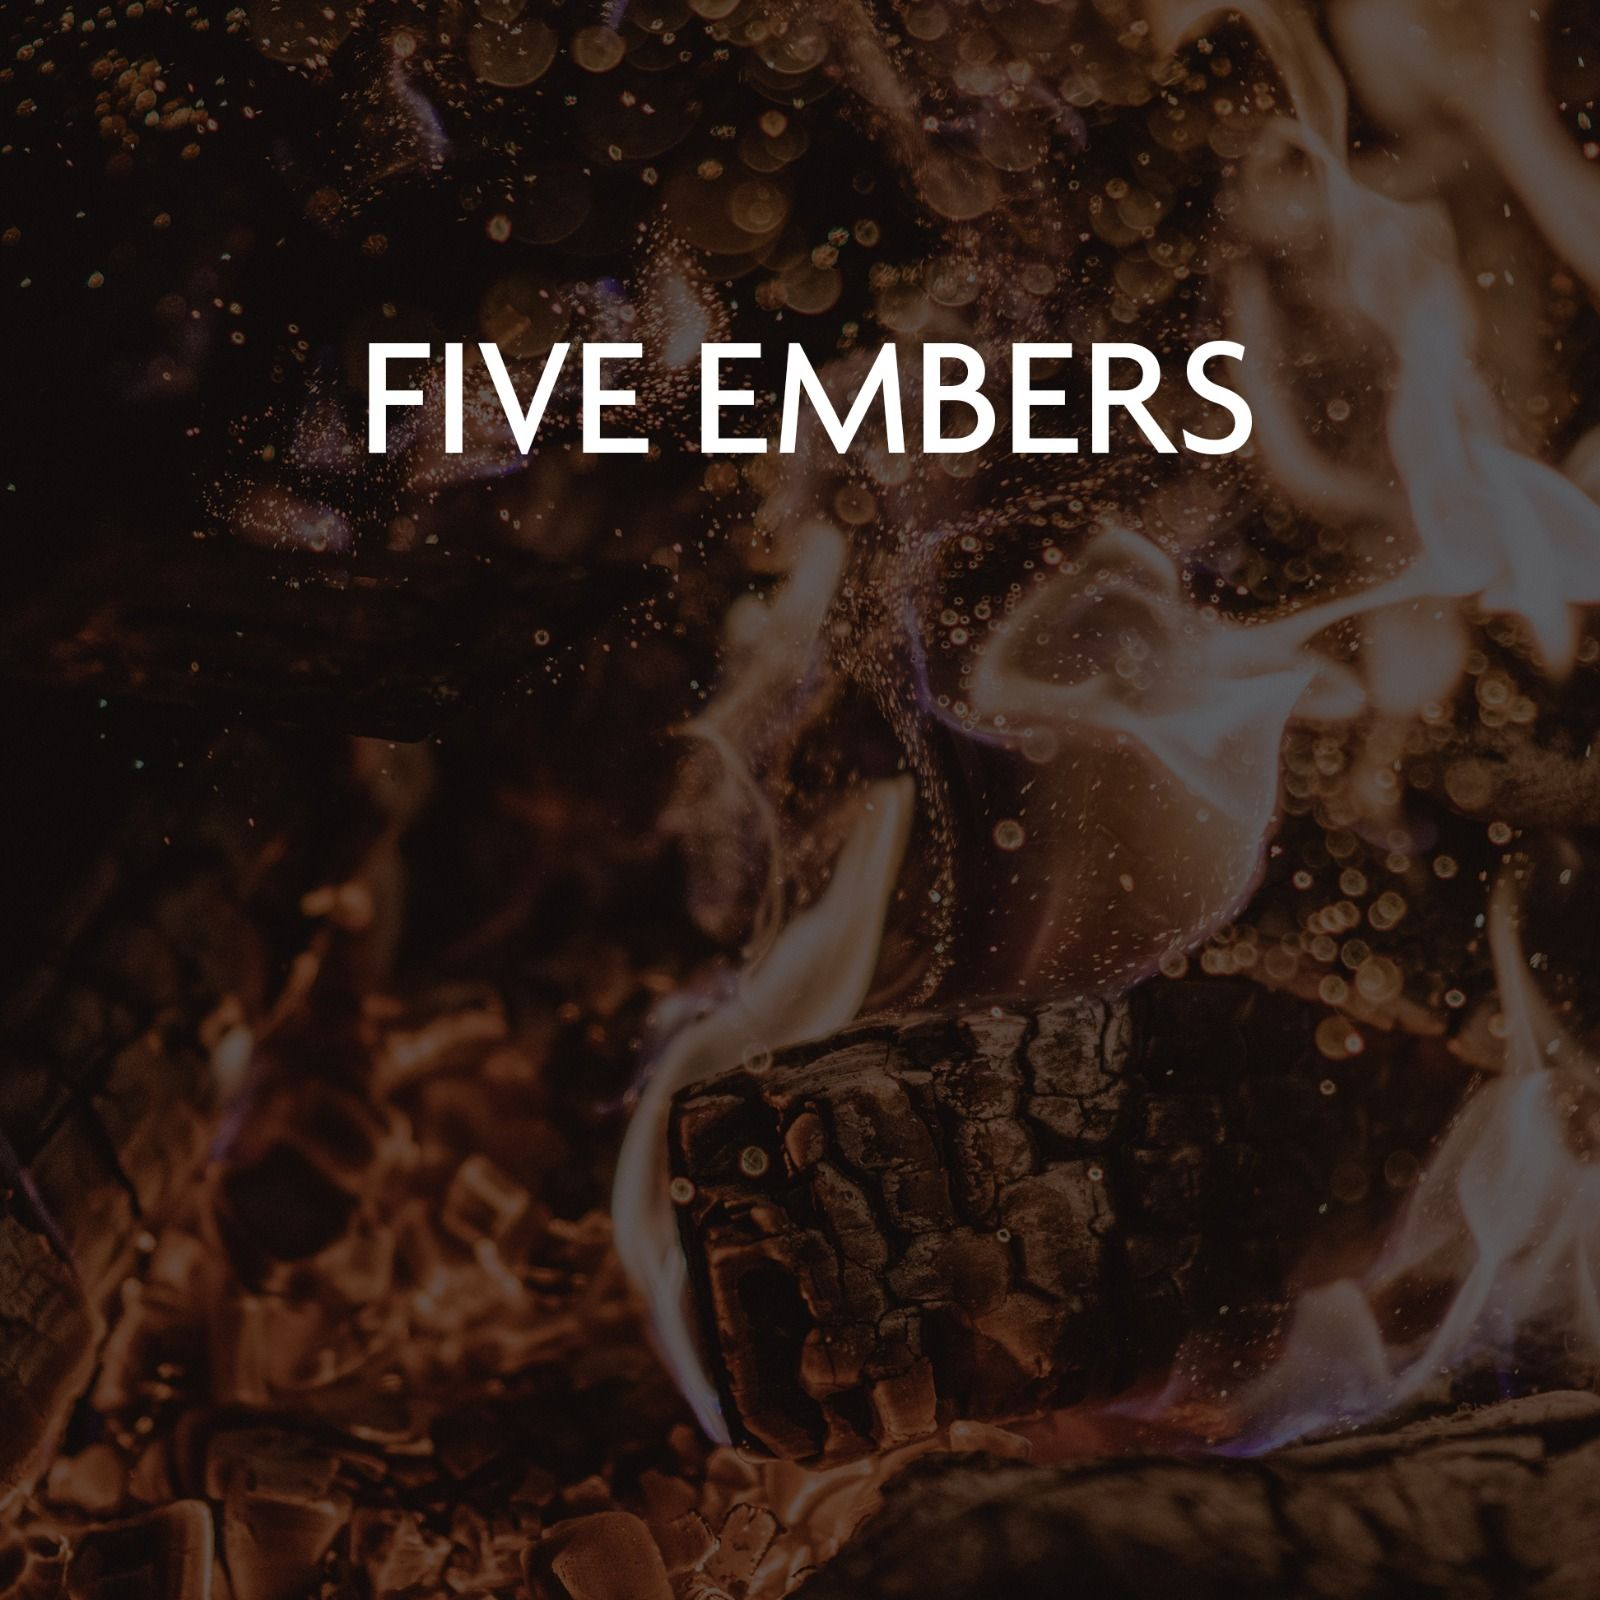 Five Embers